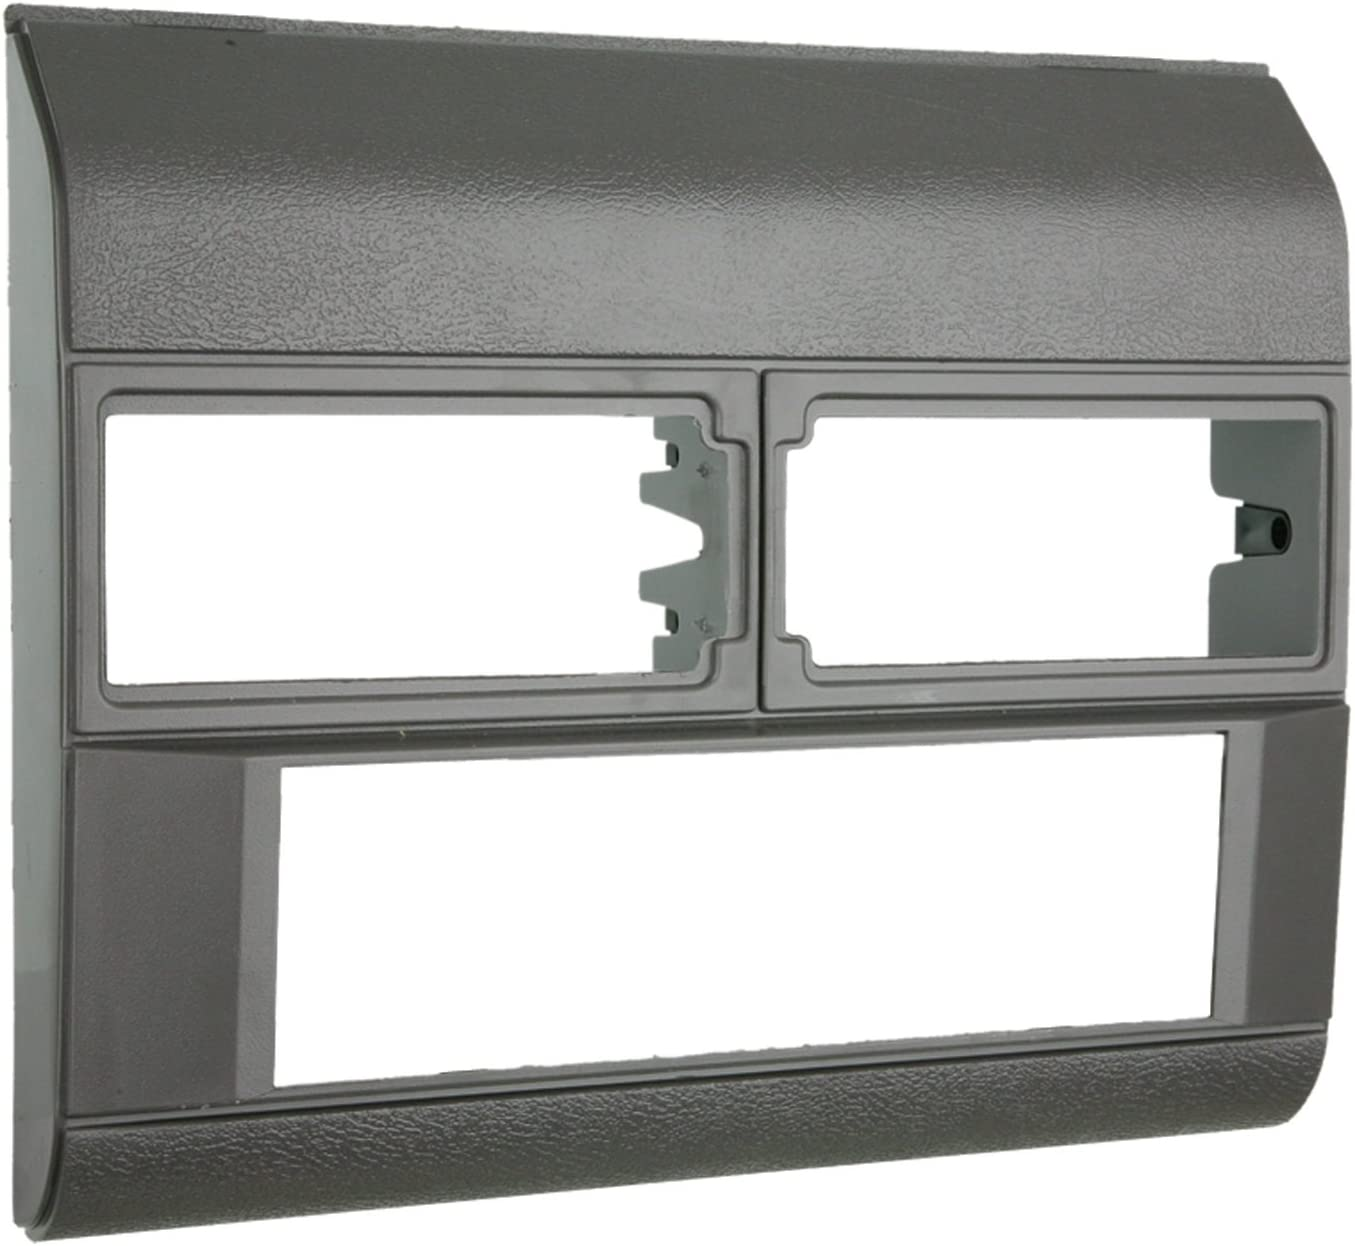 Scosche GM1482DBB Single DIN Installation Dash Kit for Select 1988-1994 Chevrolet /& GM Trucks Dark Blue